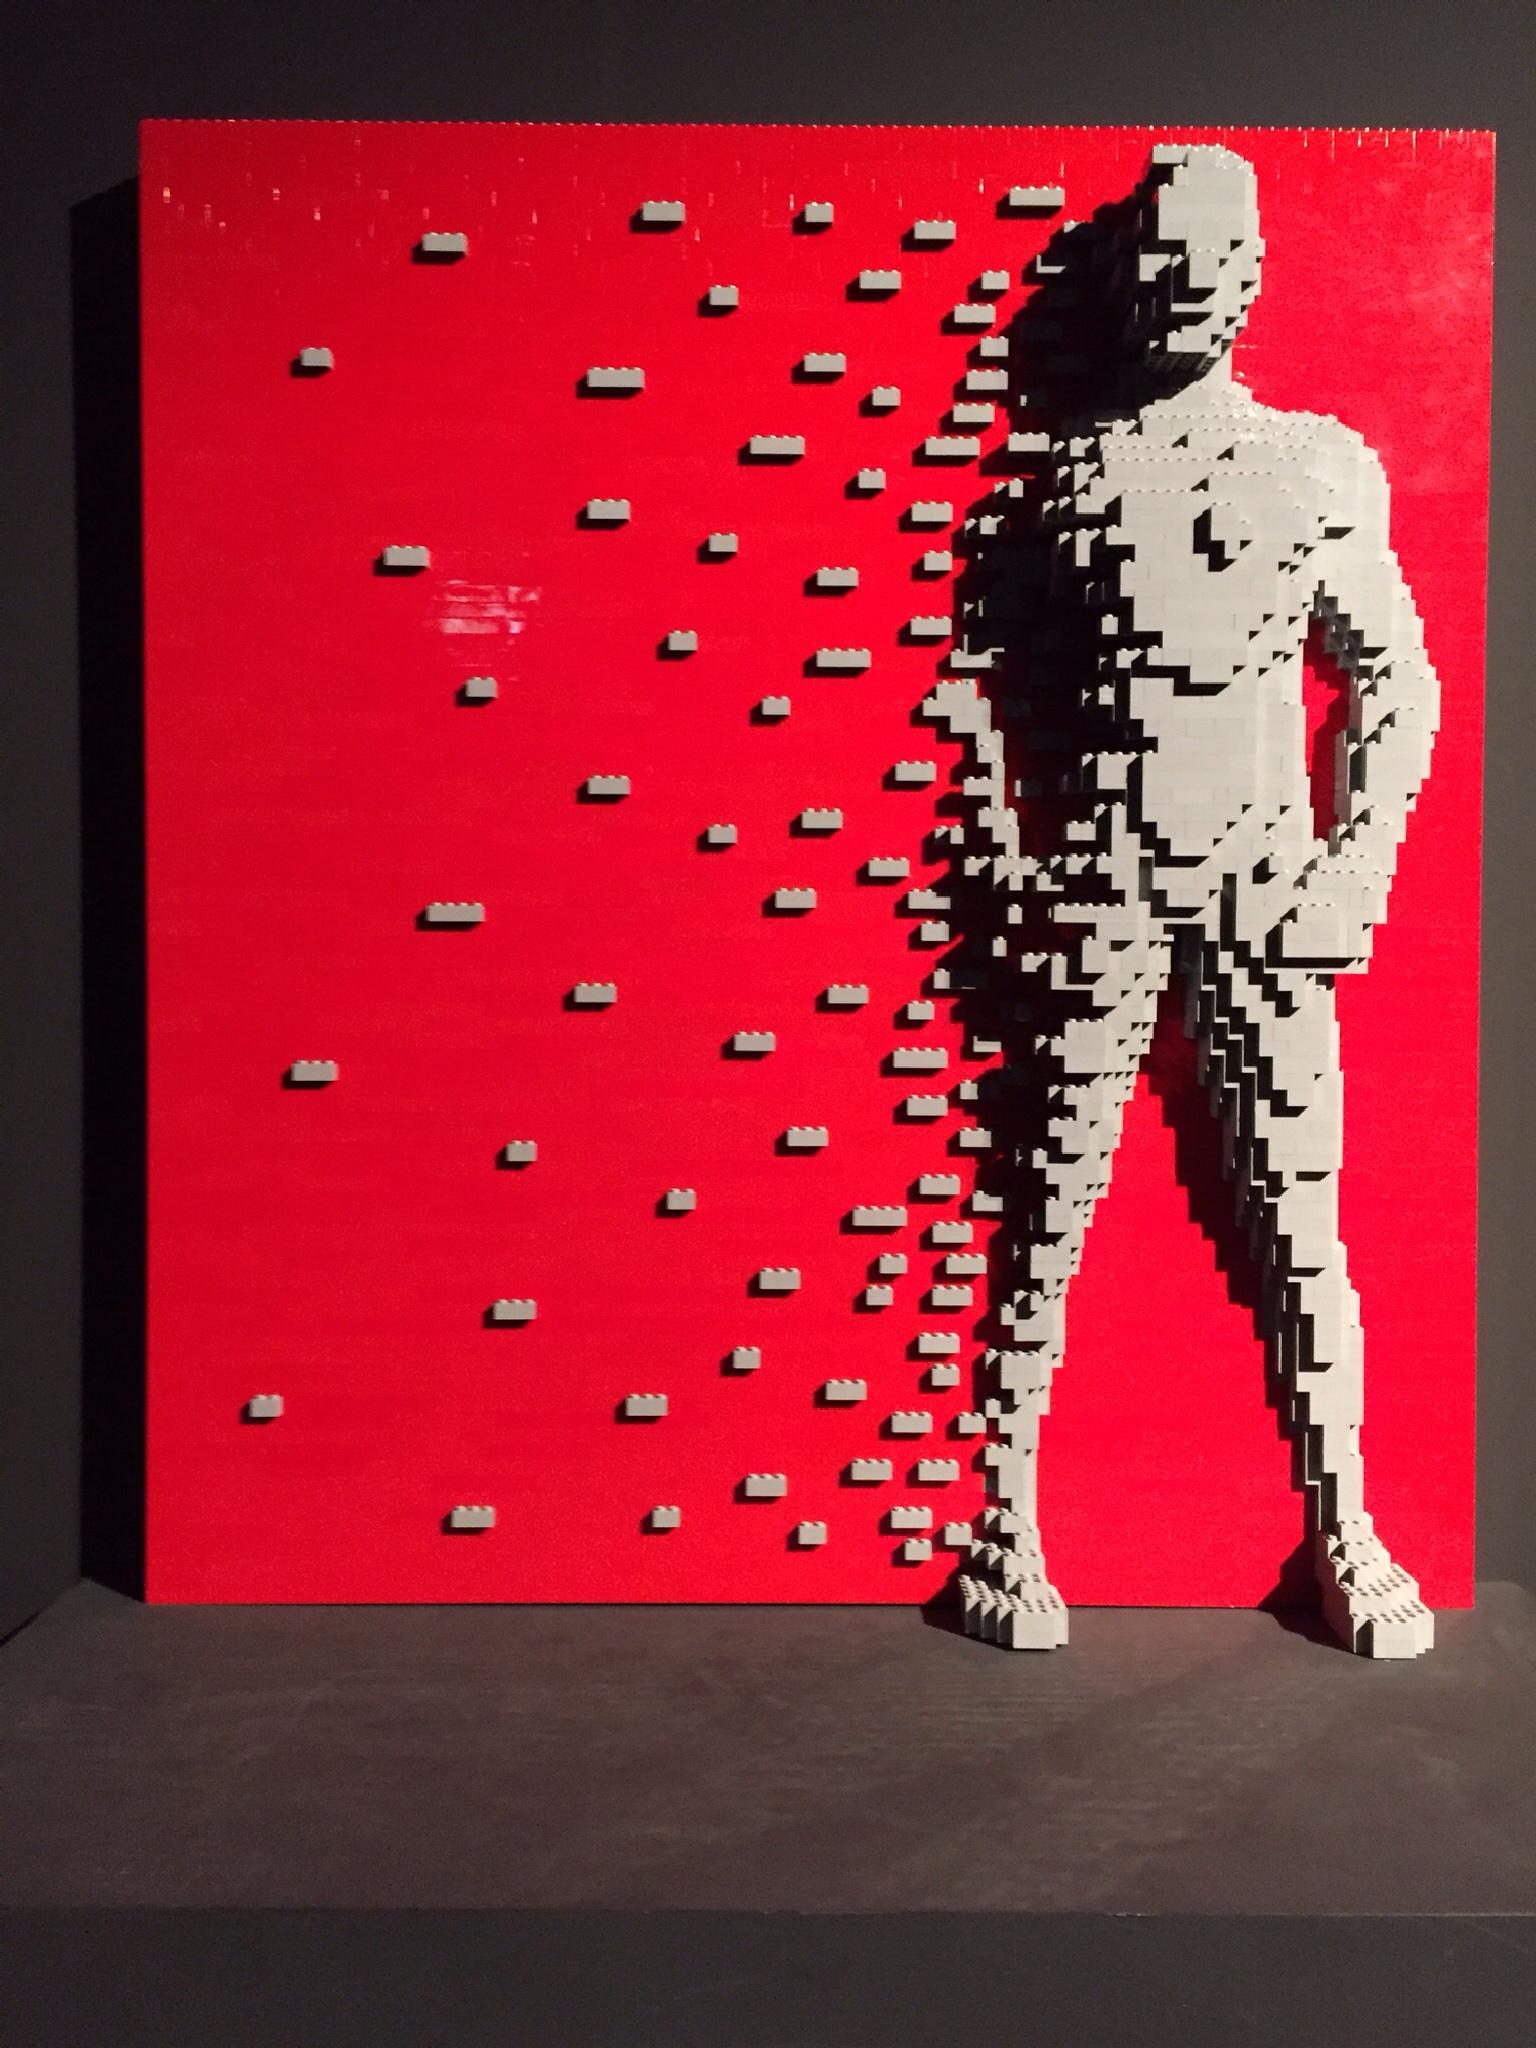 LEGO sculpture by Nathan Sawaya  by Douwe Hoekstra